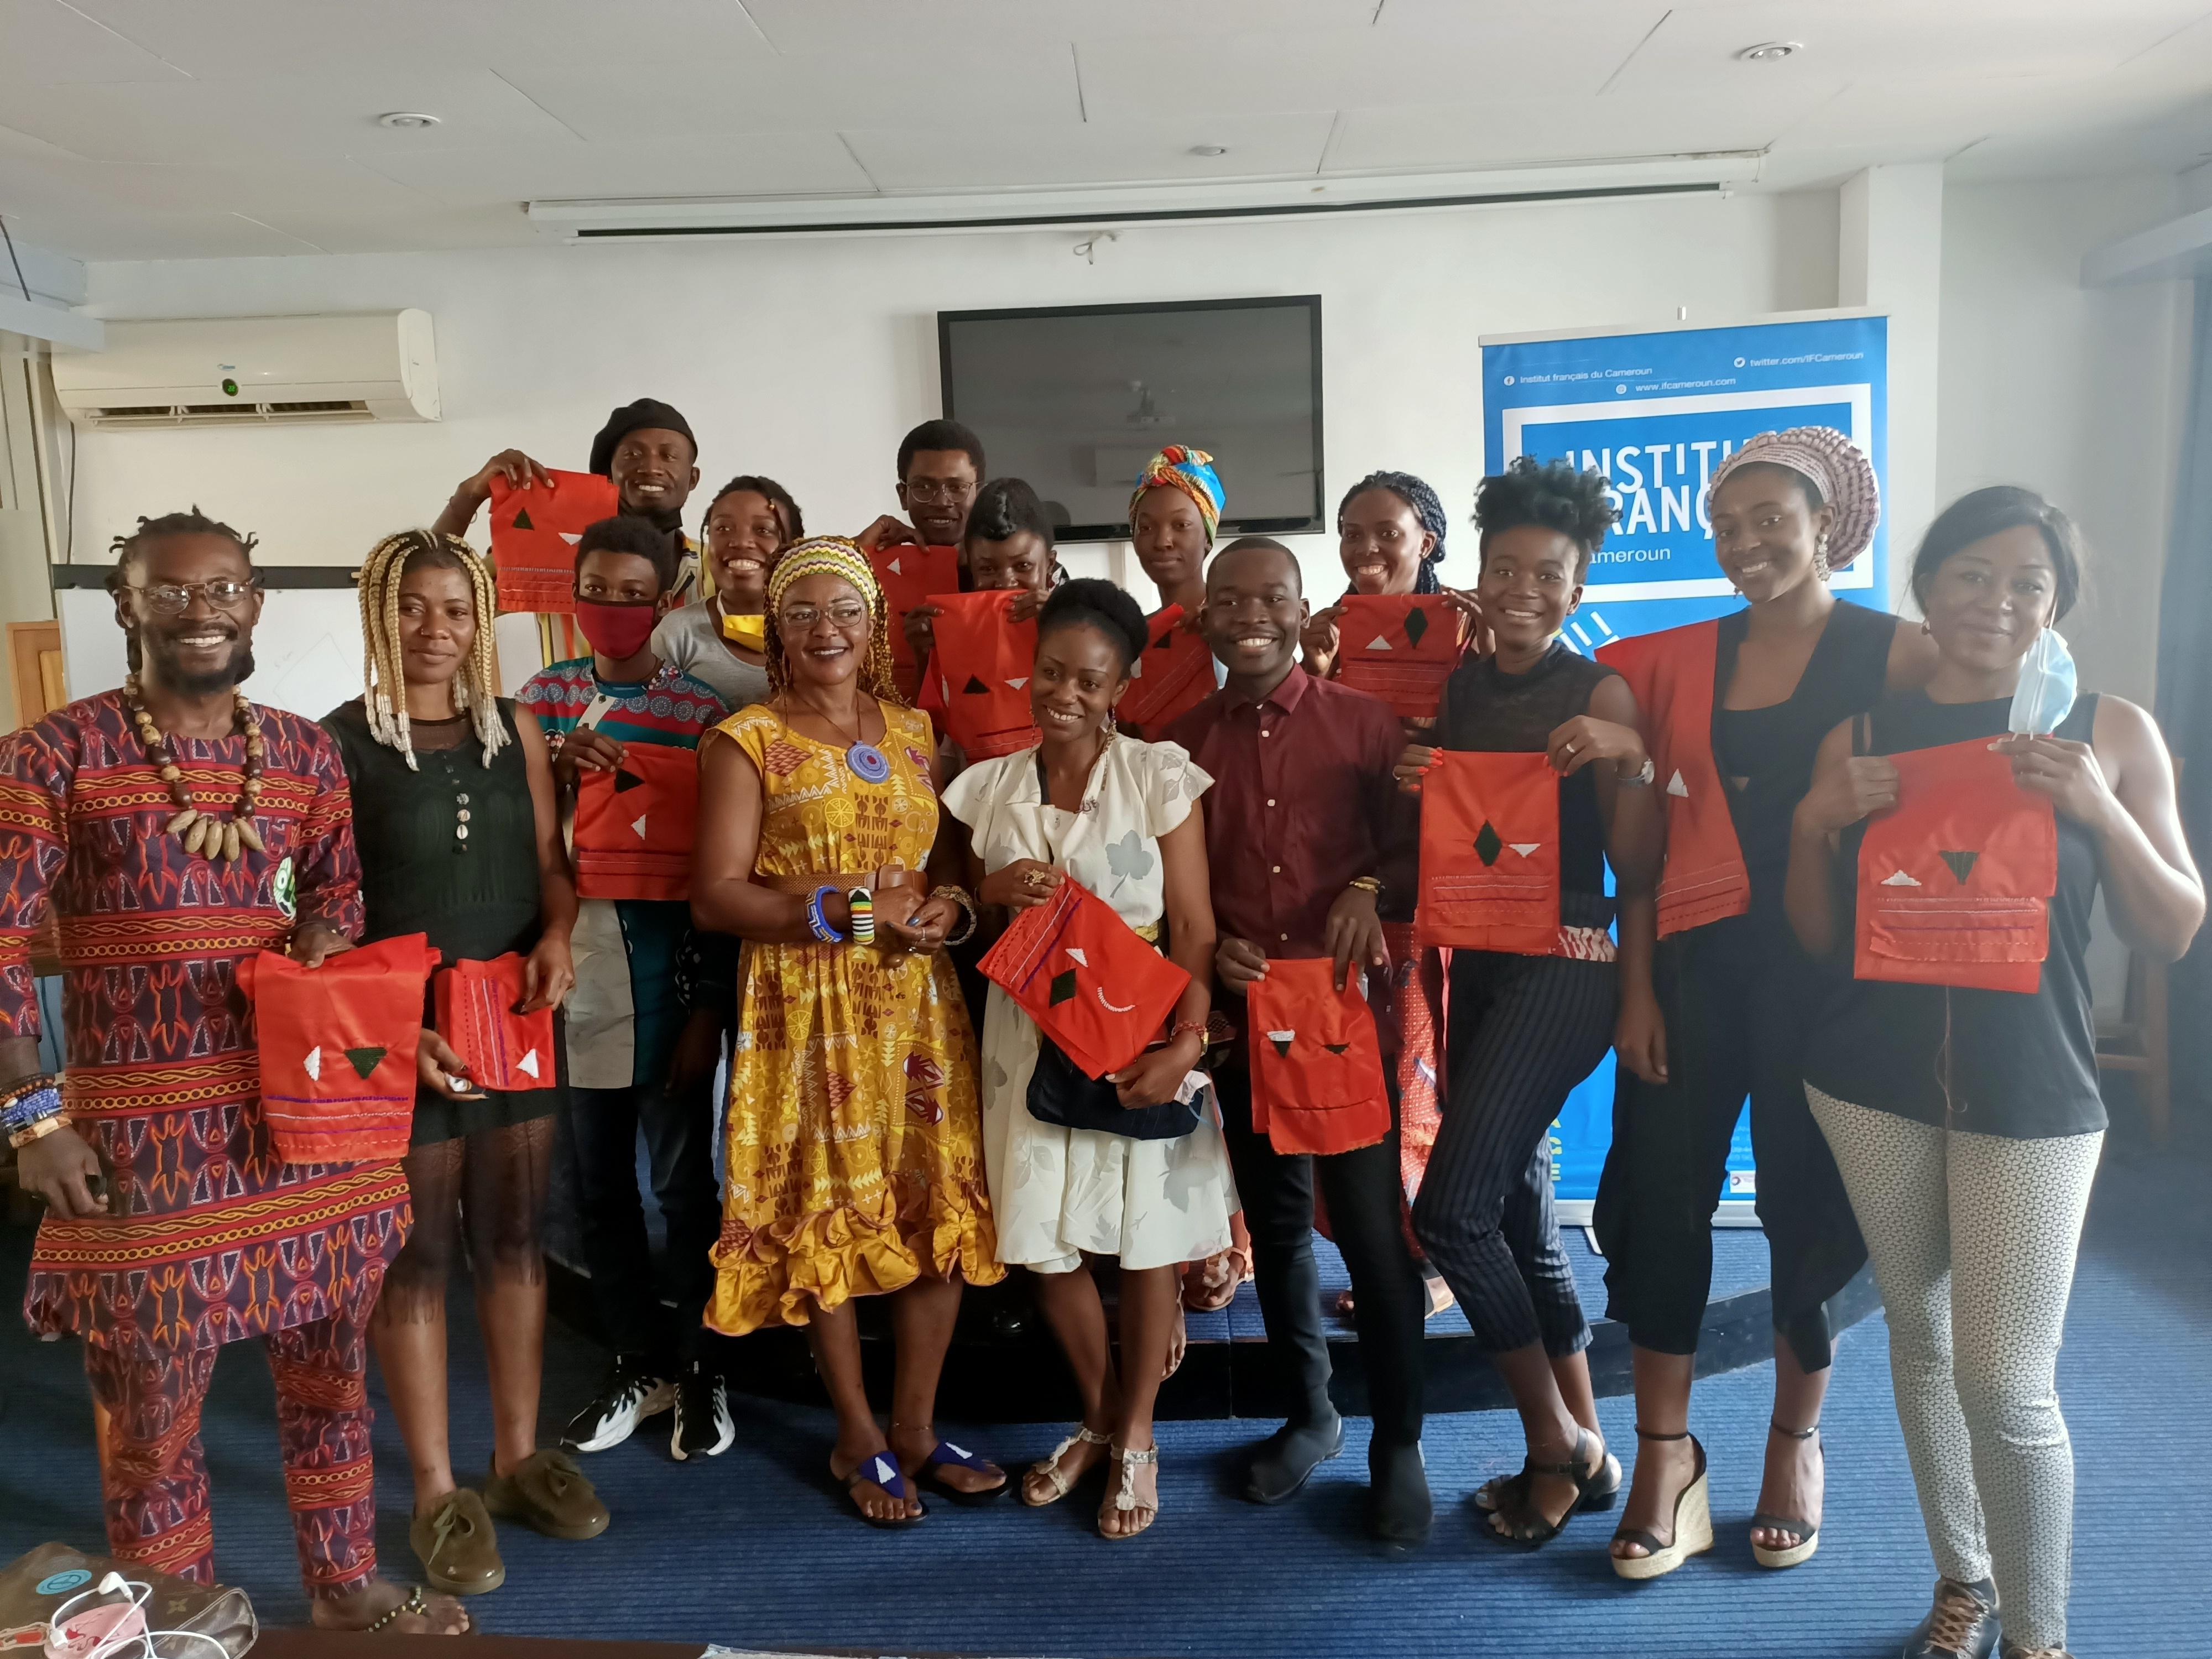 Professional Workshop - Beadwork on Textile with Igénie Nomba